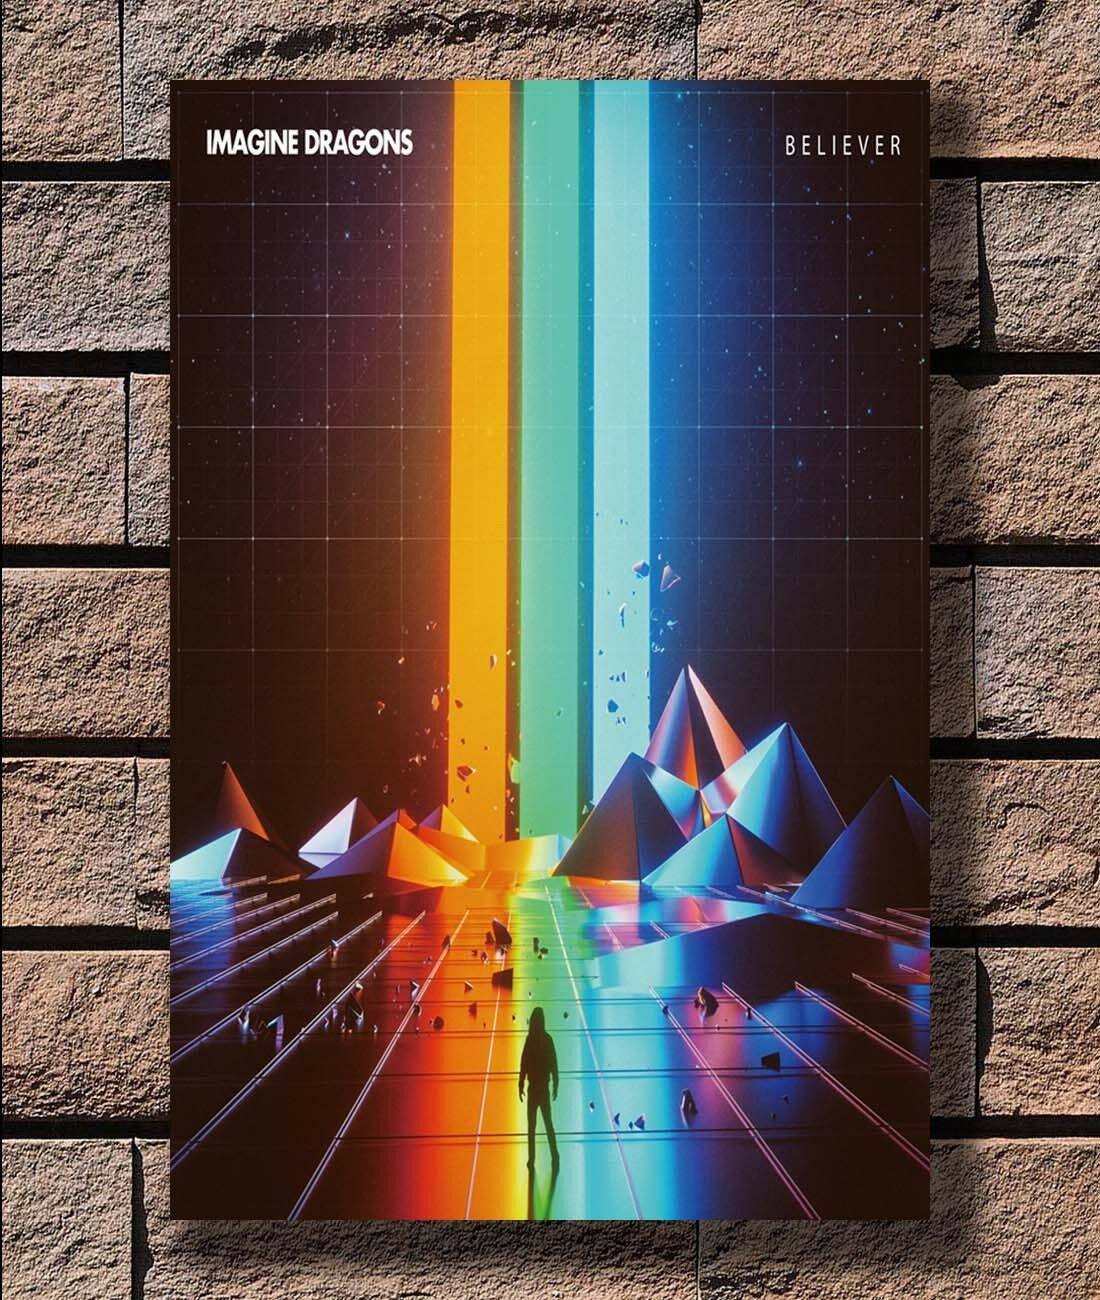 Hot Fabric Poster Imagine Dragons Rock Music Group 36x24 30x20 40x27inc Z153